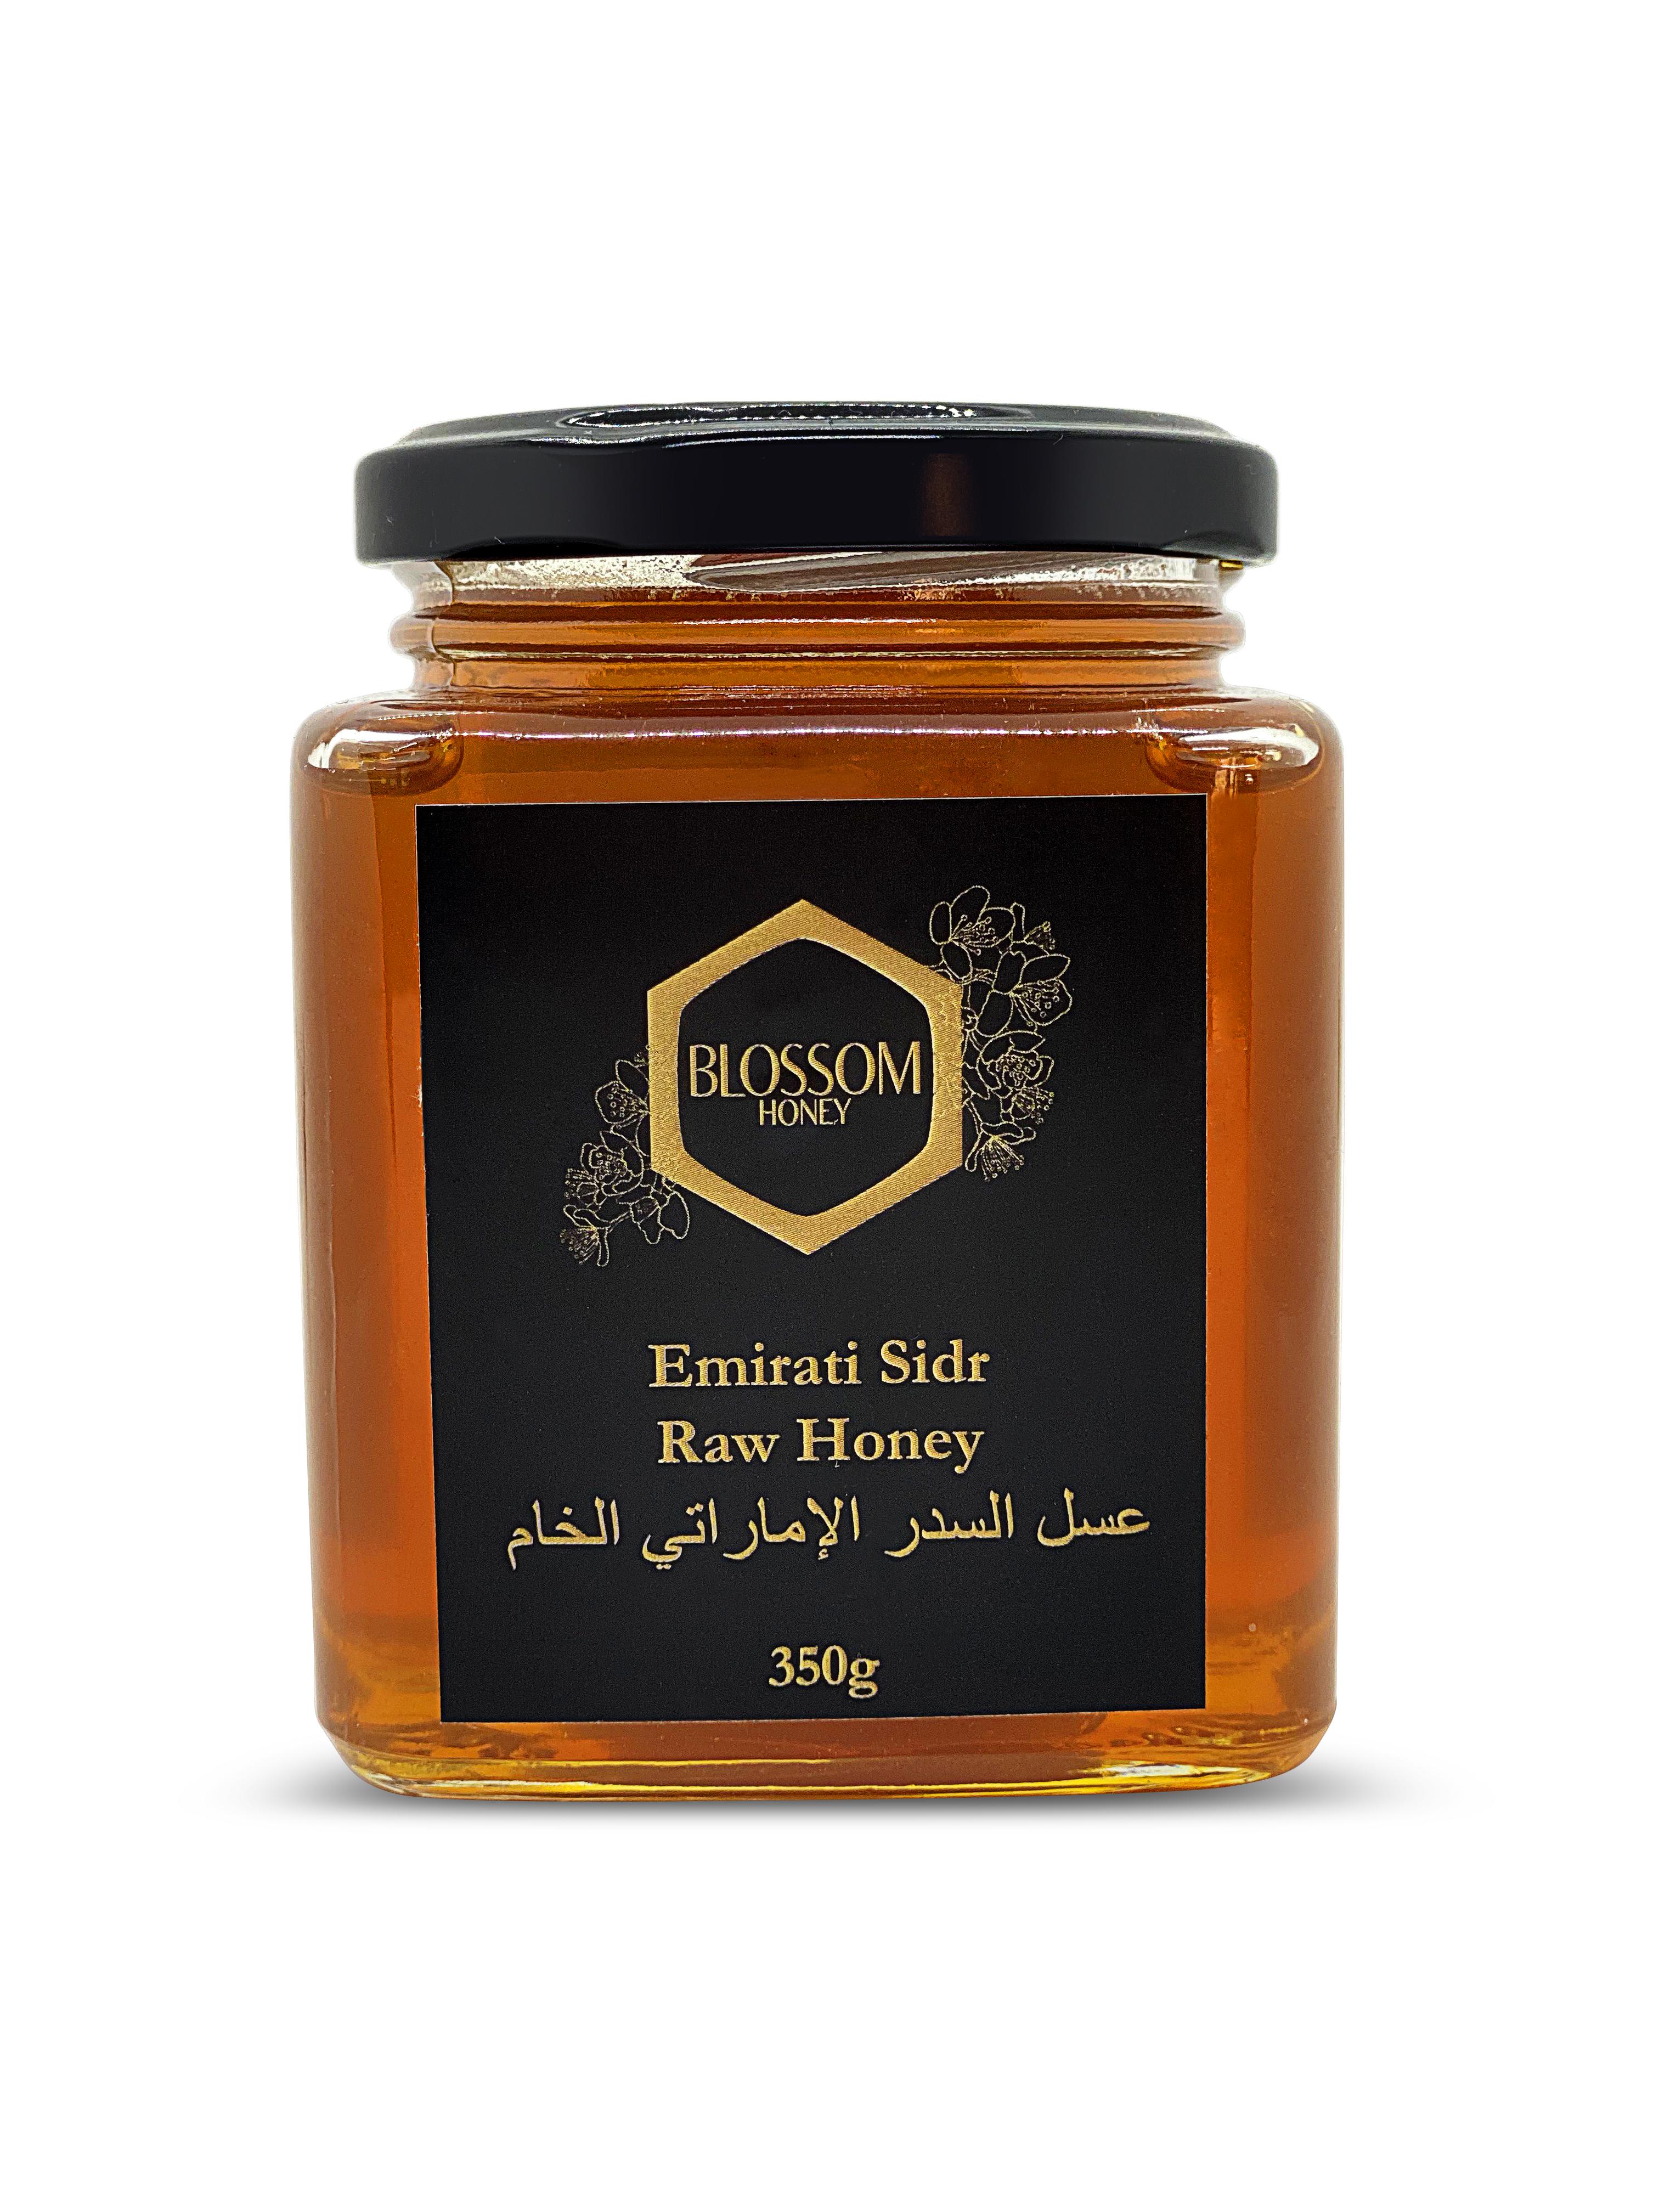 Emirati Sidr Raw Honey